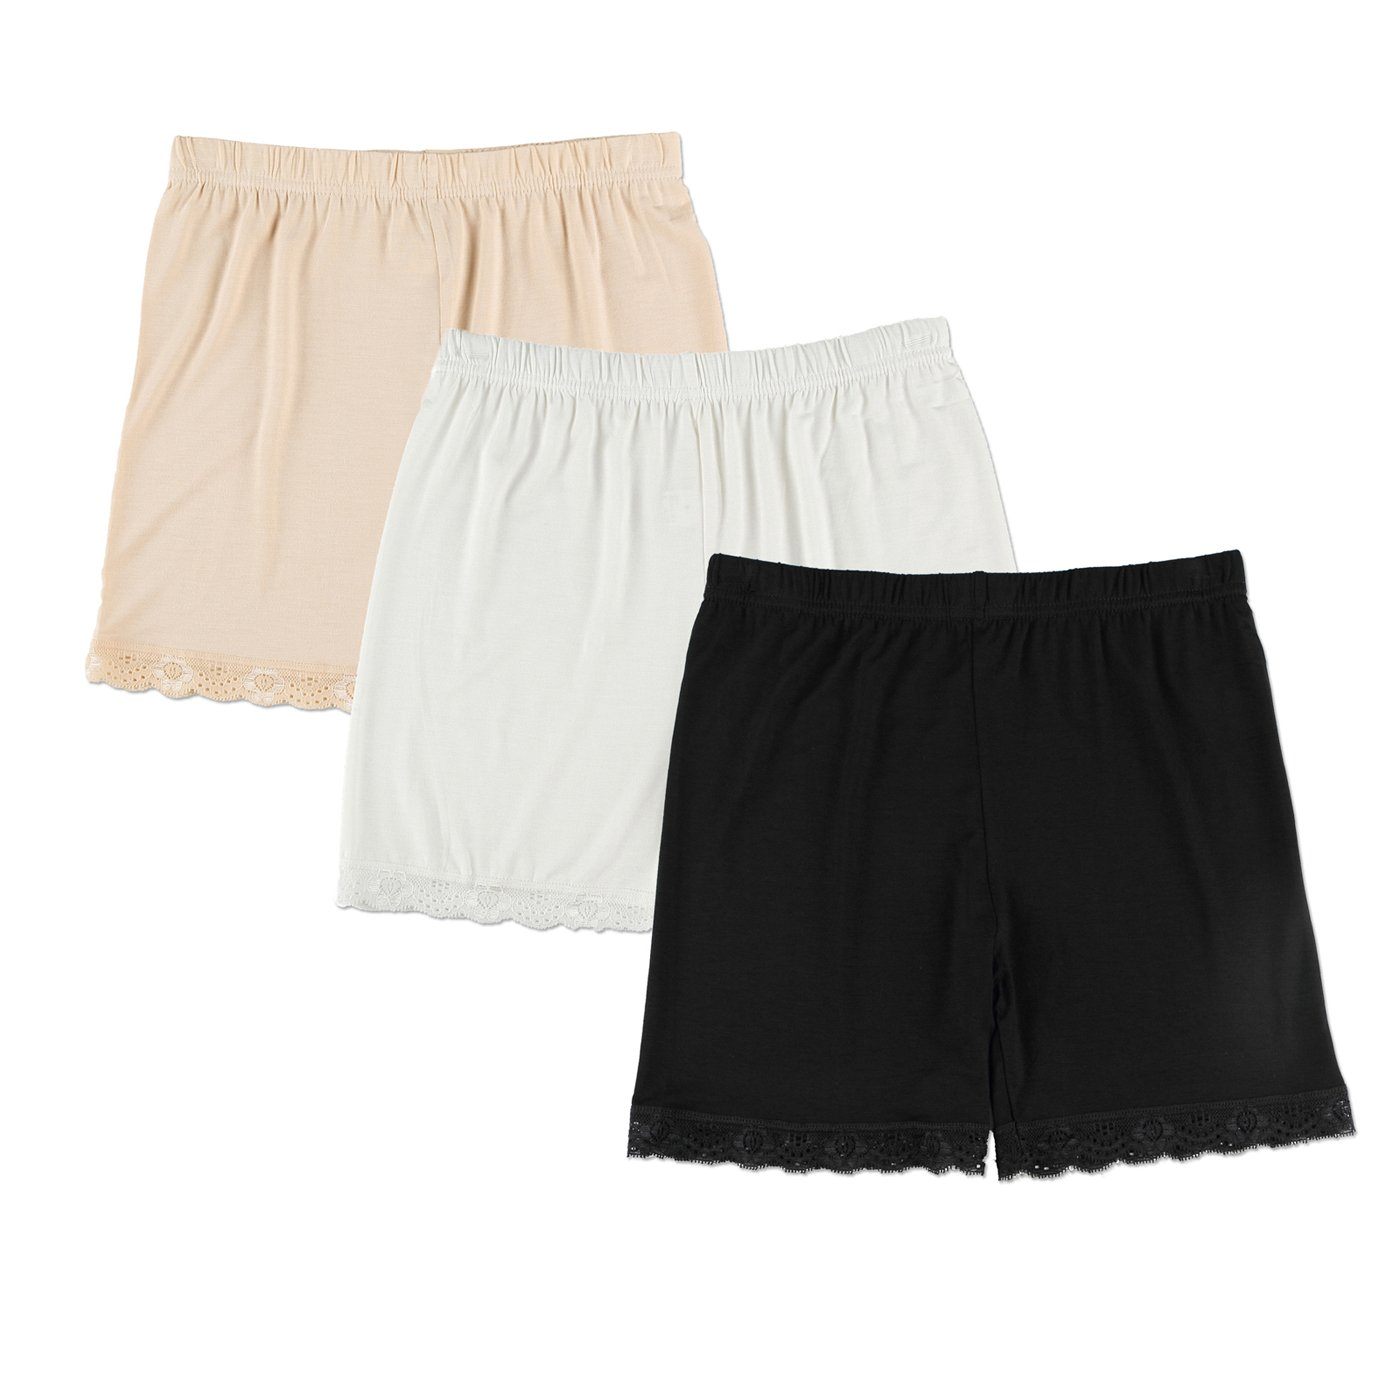 Liang Rou Women's Ultra Thin Stretch Short Leggings Lace Trim Black/ Apricot/ White L Large 3-pack: Lace Trim Black/White/Apricot